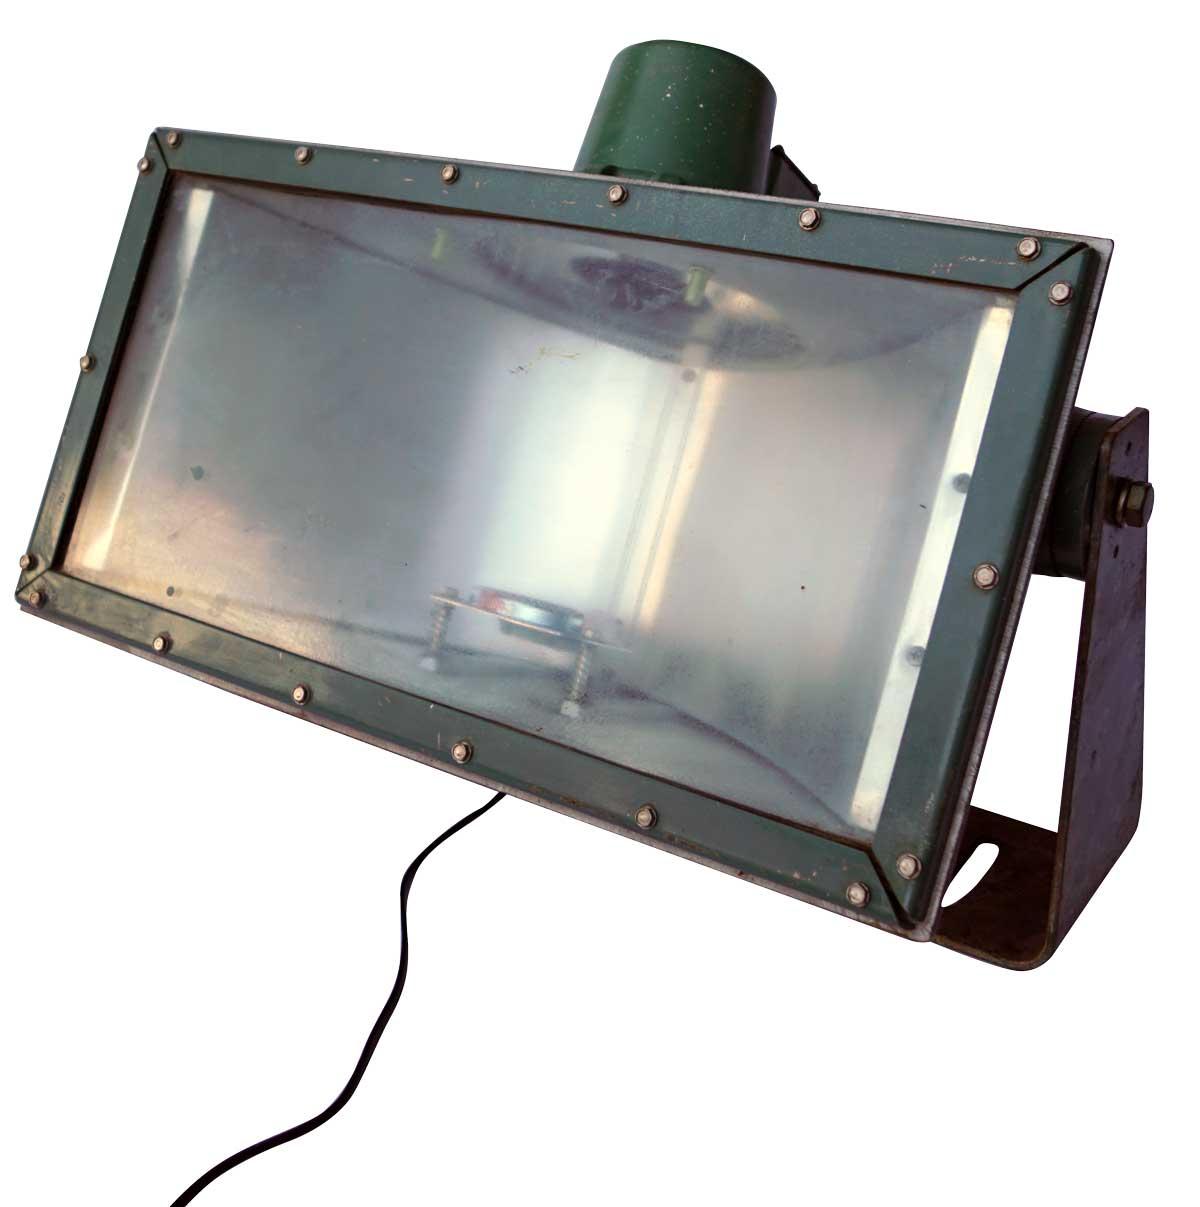 TRADEMARK LIVING Original gammel industrilampe - grøn jern